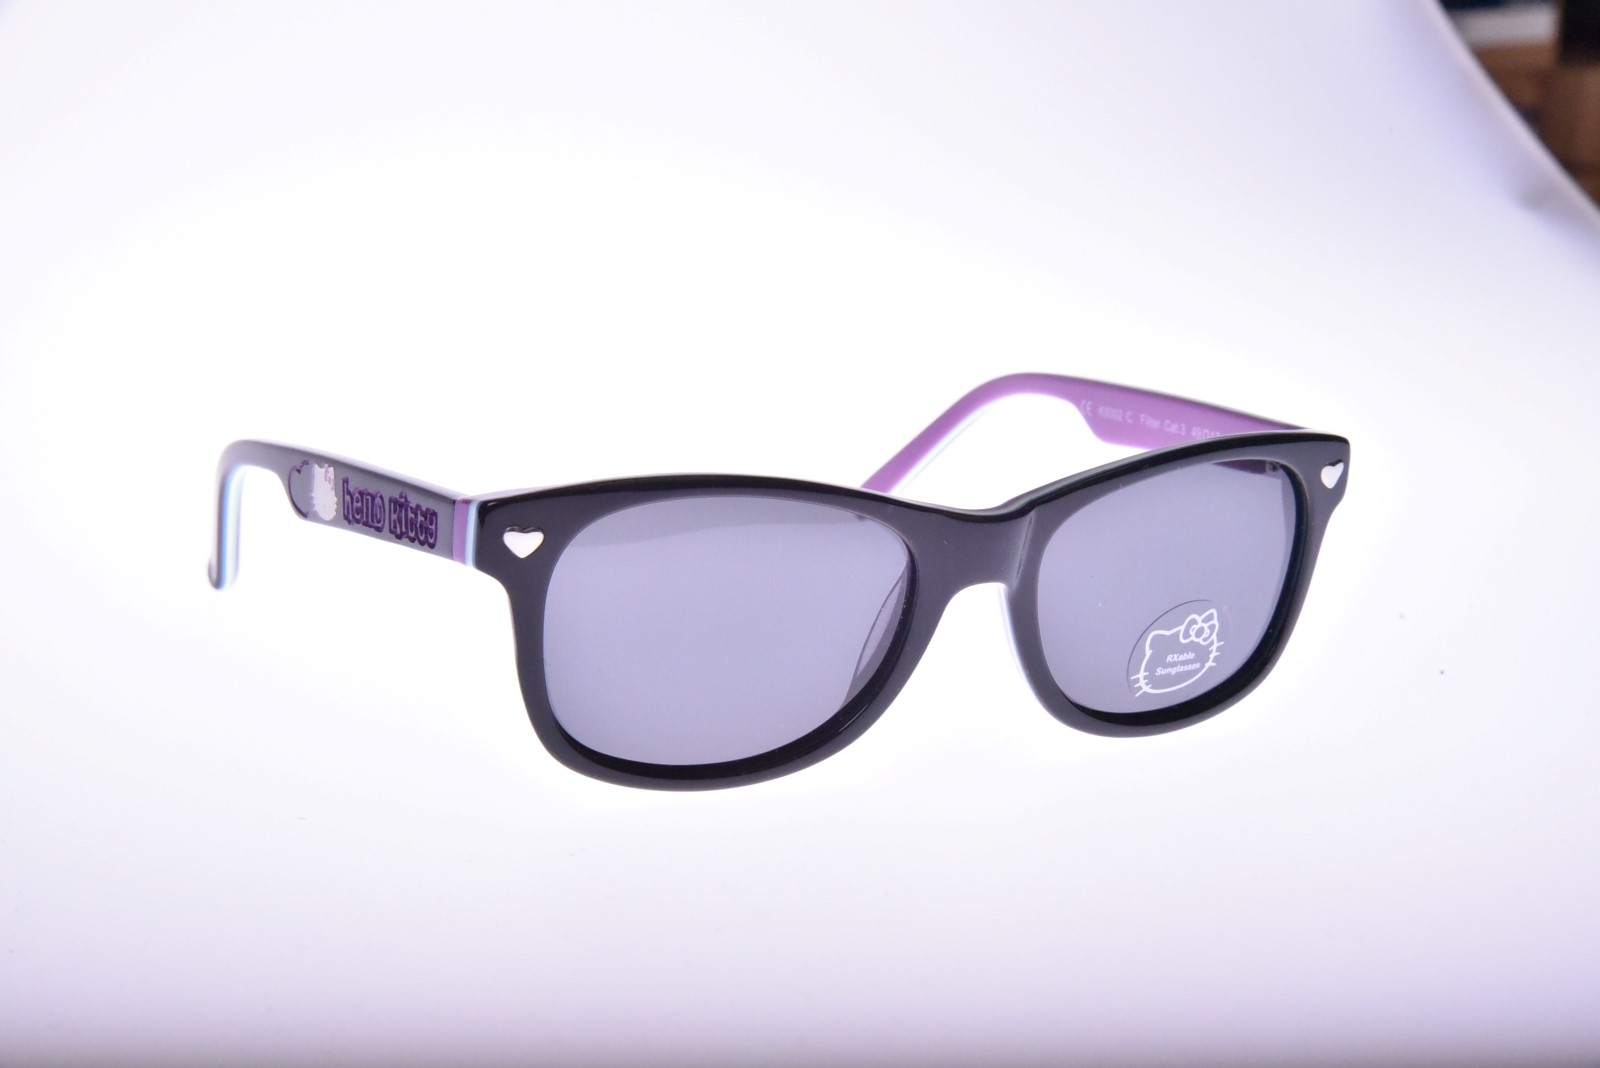 Polaroid Hello Kitty K9302C - Slnečné okuliare pre deti 4-7 r.